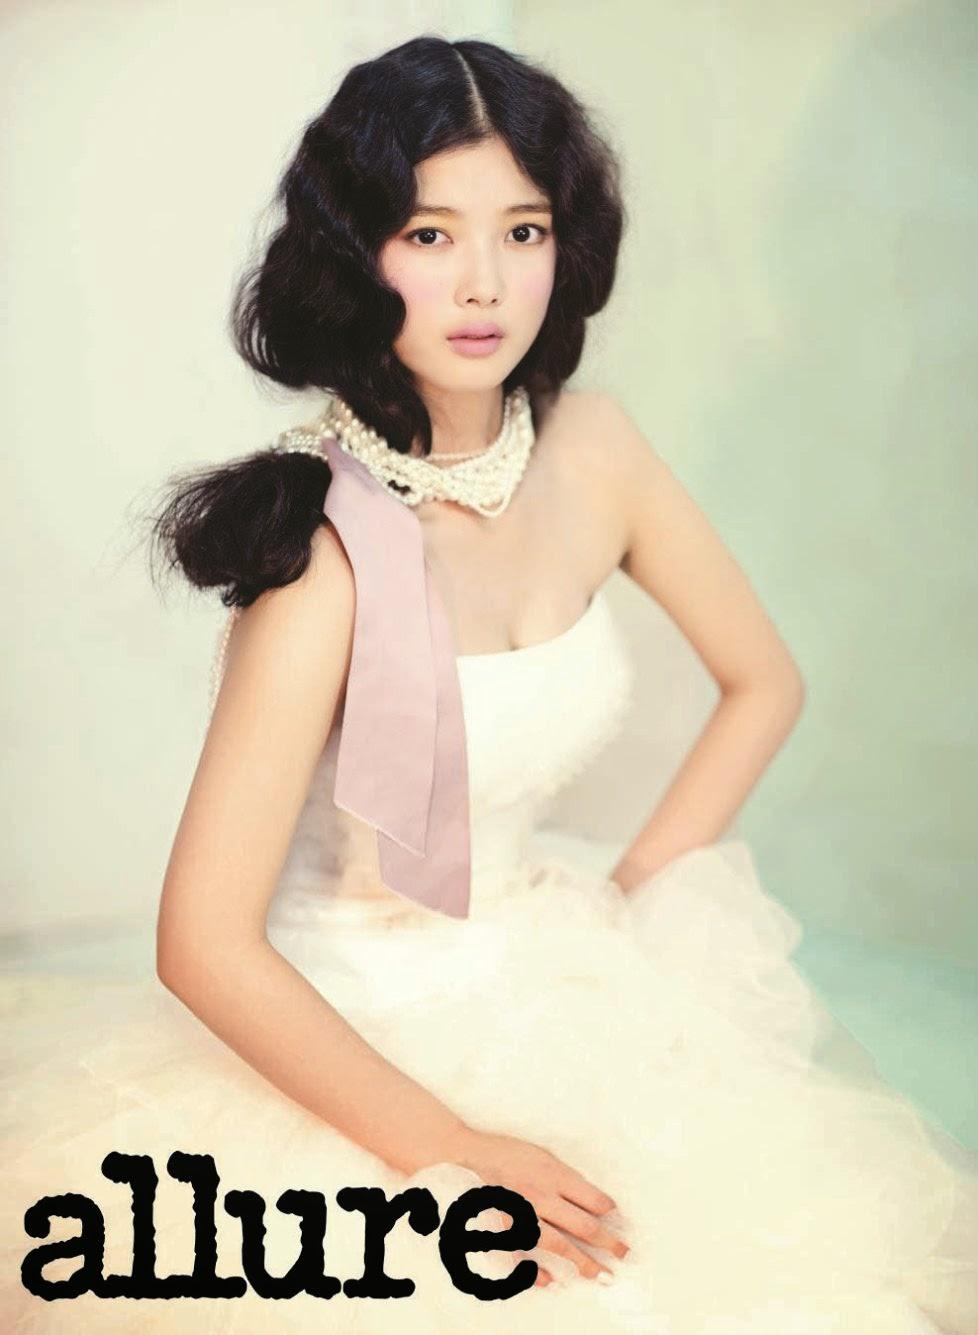 Kim Yoo Jung - Allure Magazine February Issue 2014